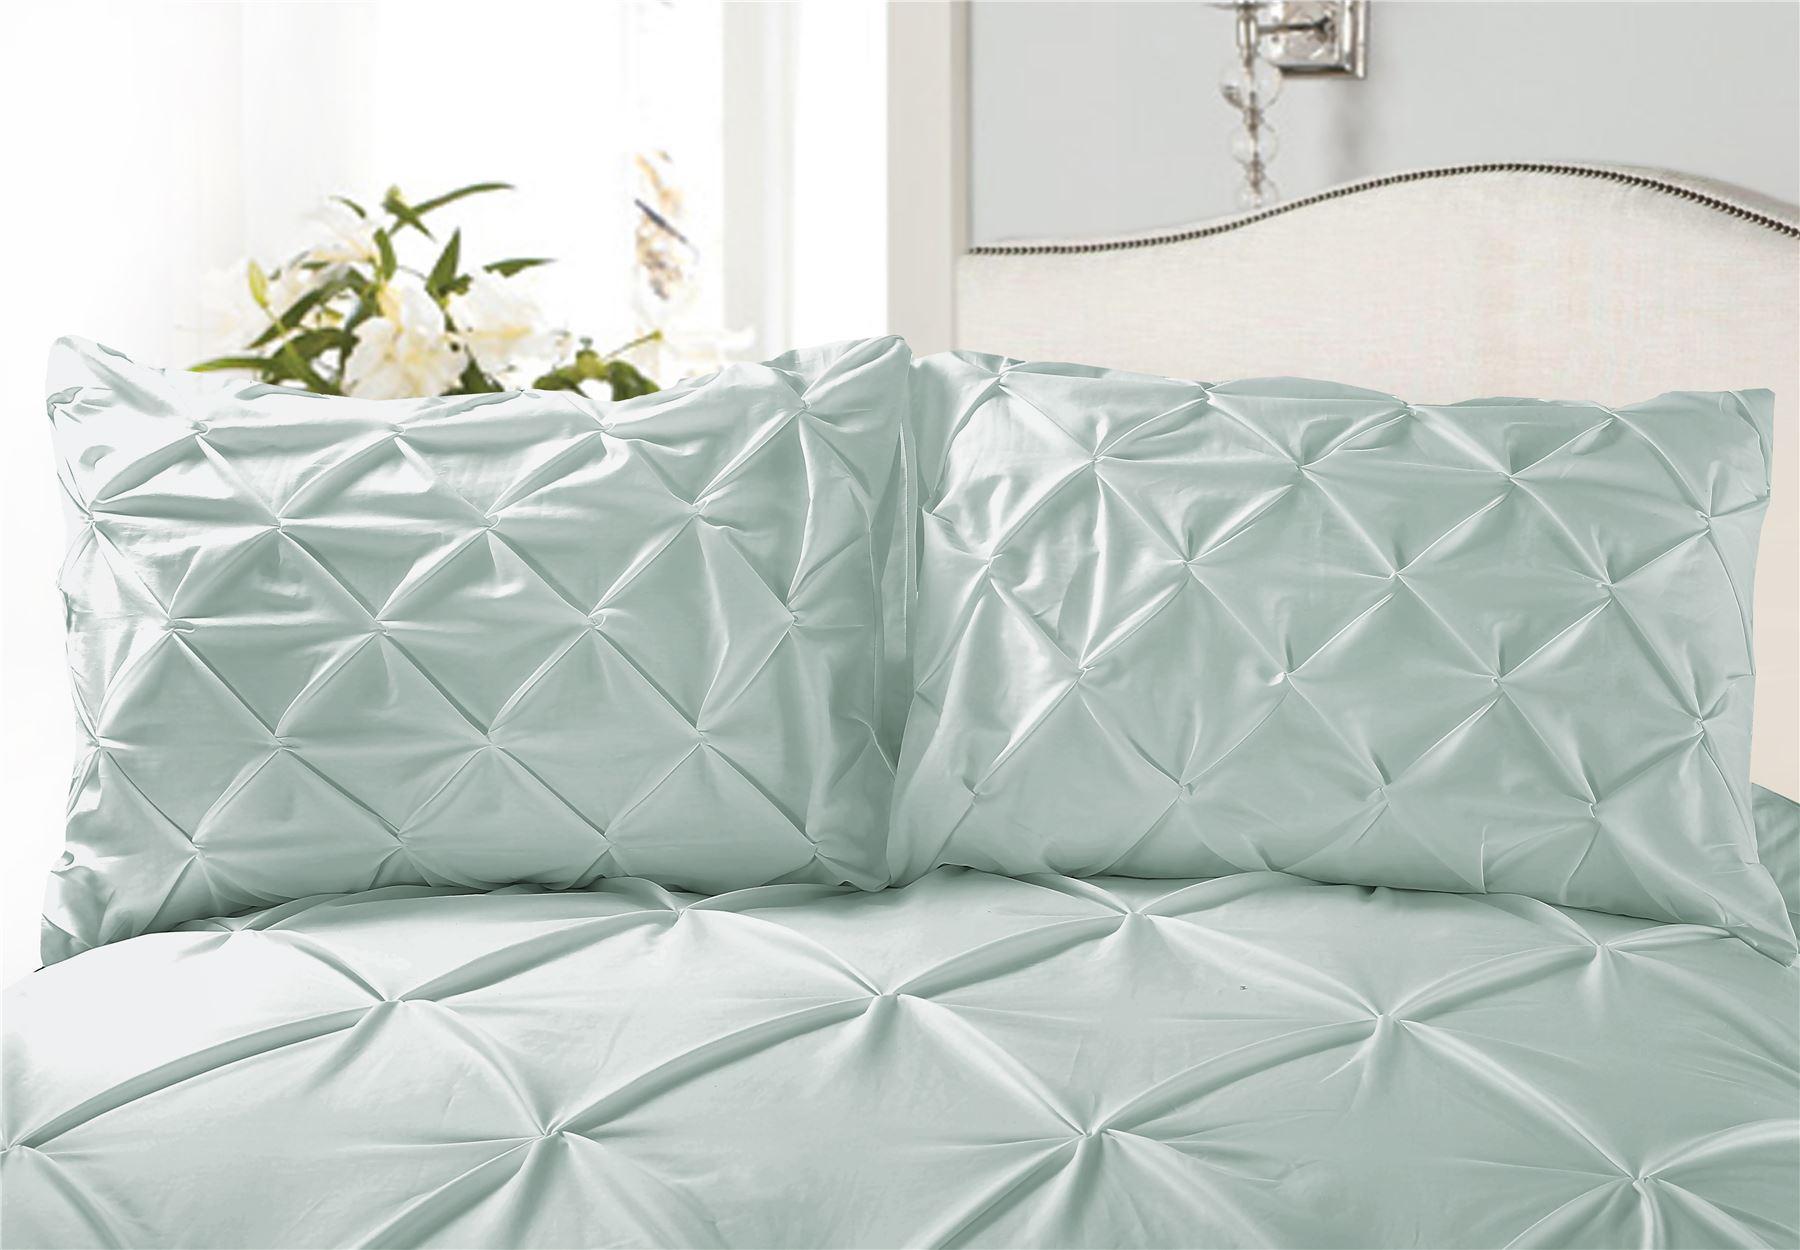 Luxury-Pure-100-Cotton-200-Thread-Pinch-Pleat-Pintuck-Puckering-Duvet-Cover-Set thumbnail 14